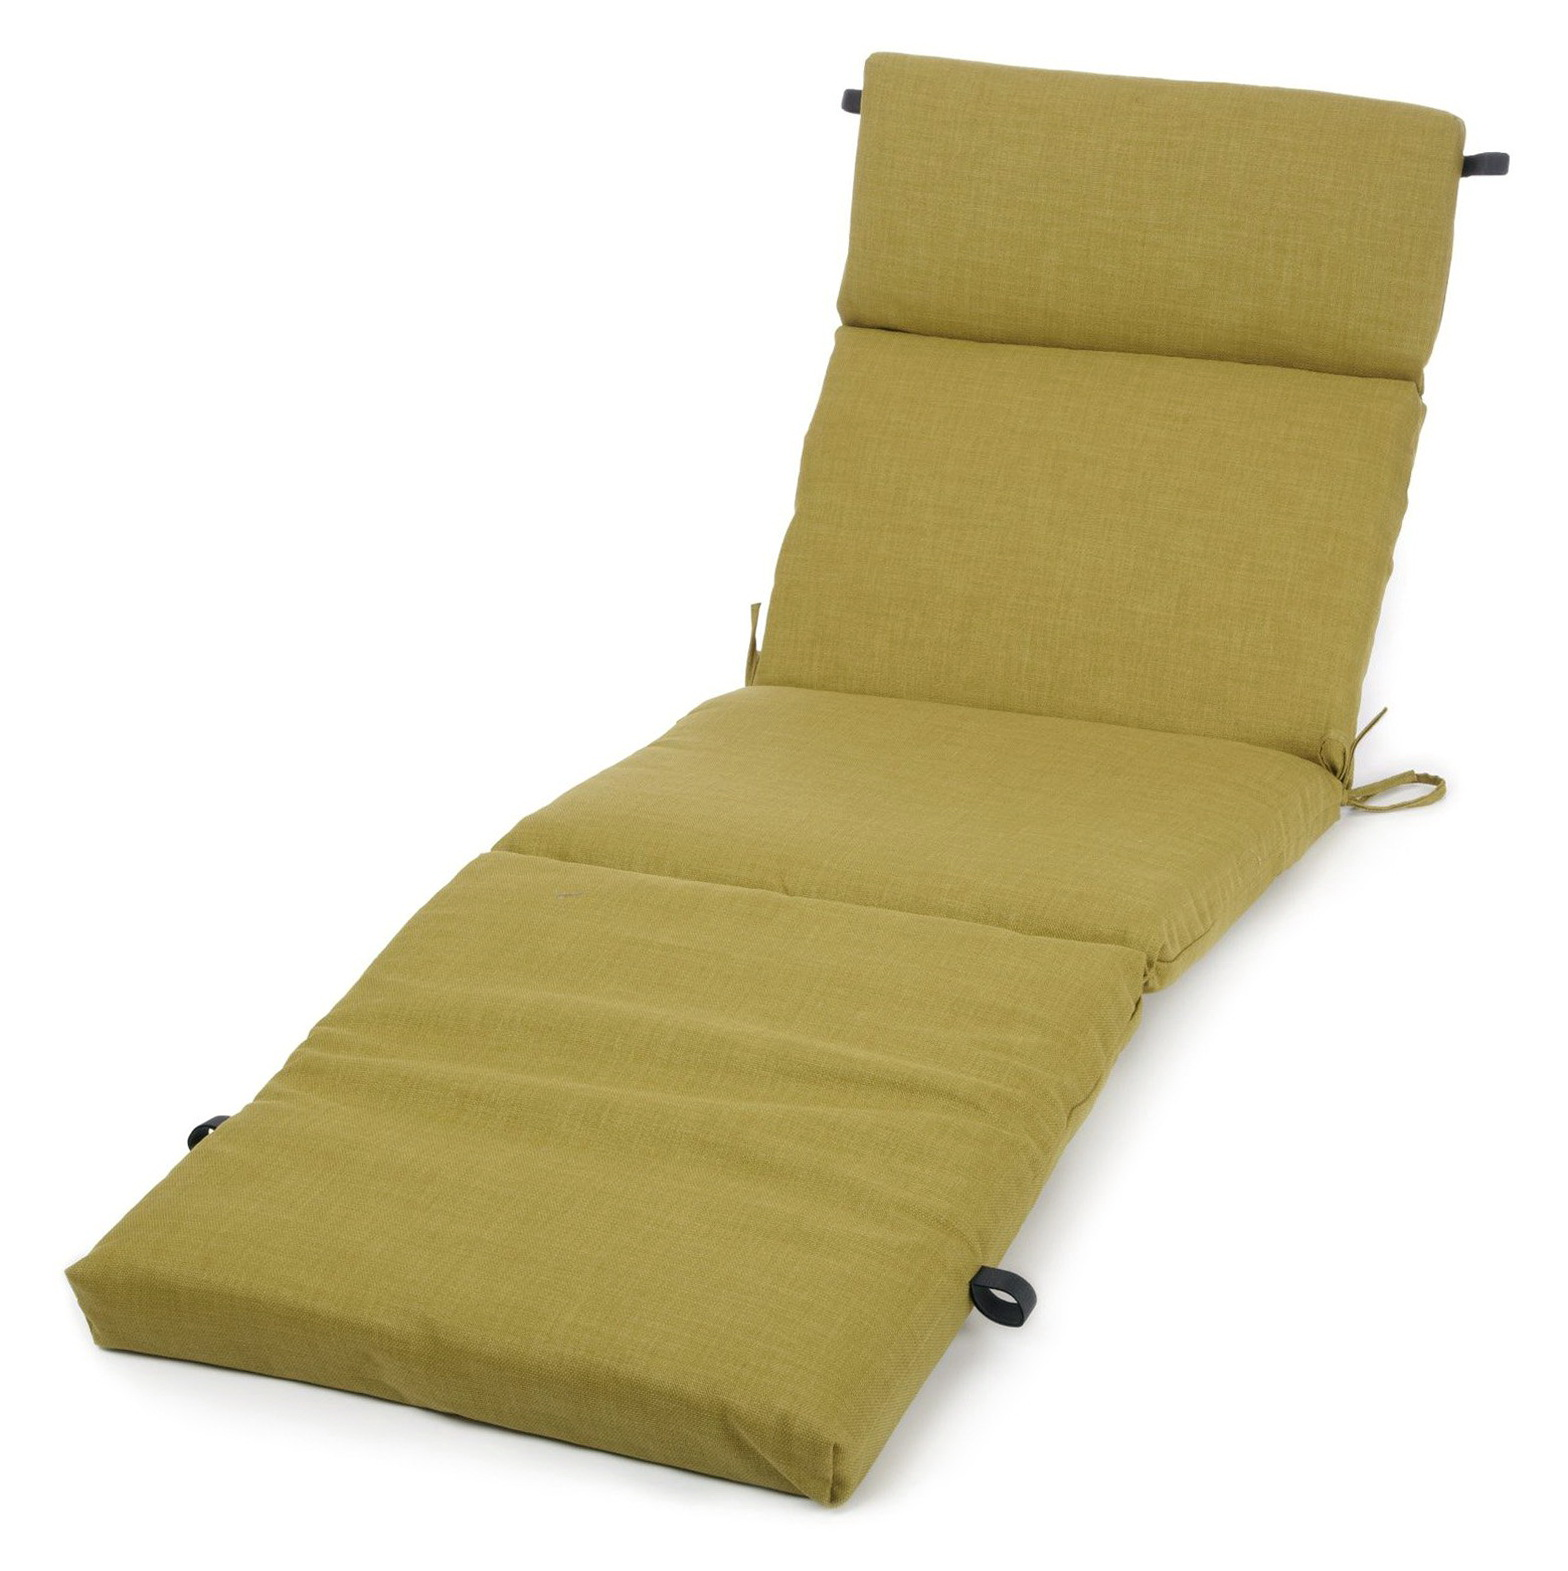 Outdoor Cushion Slipcovers Sale